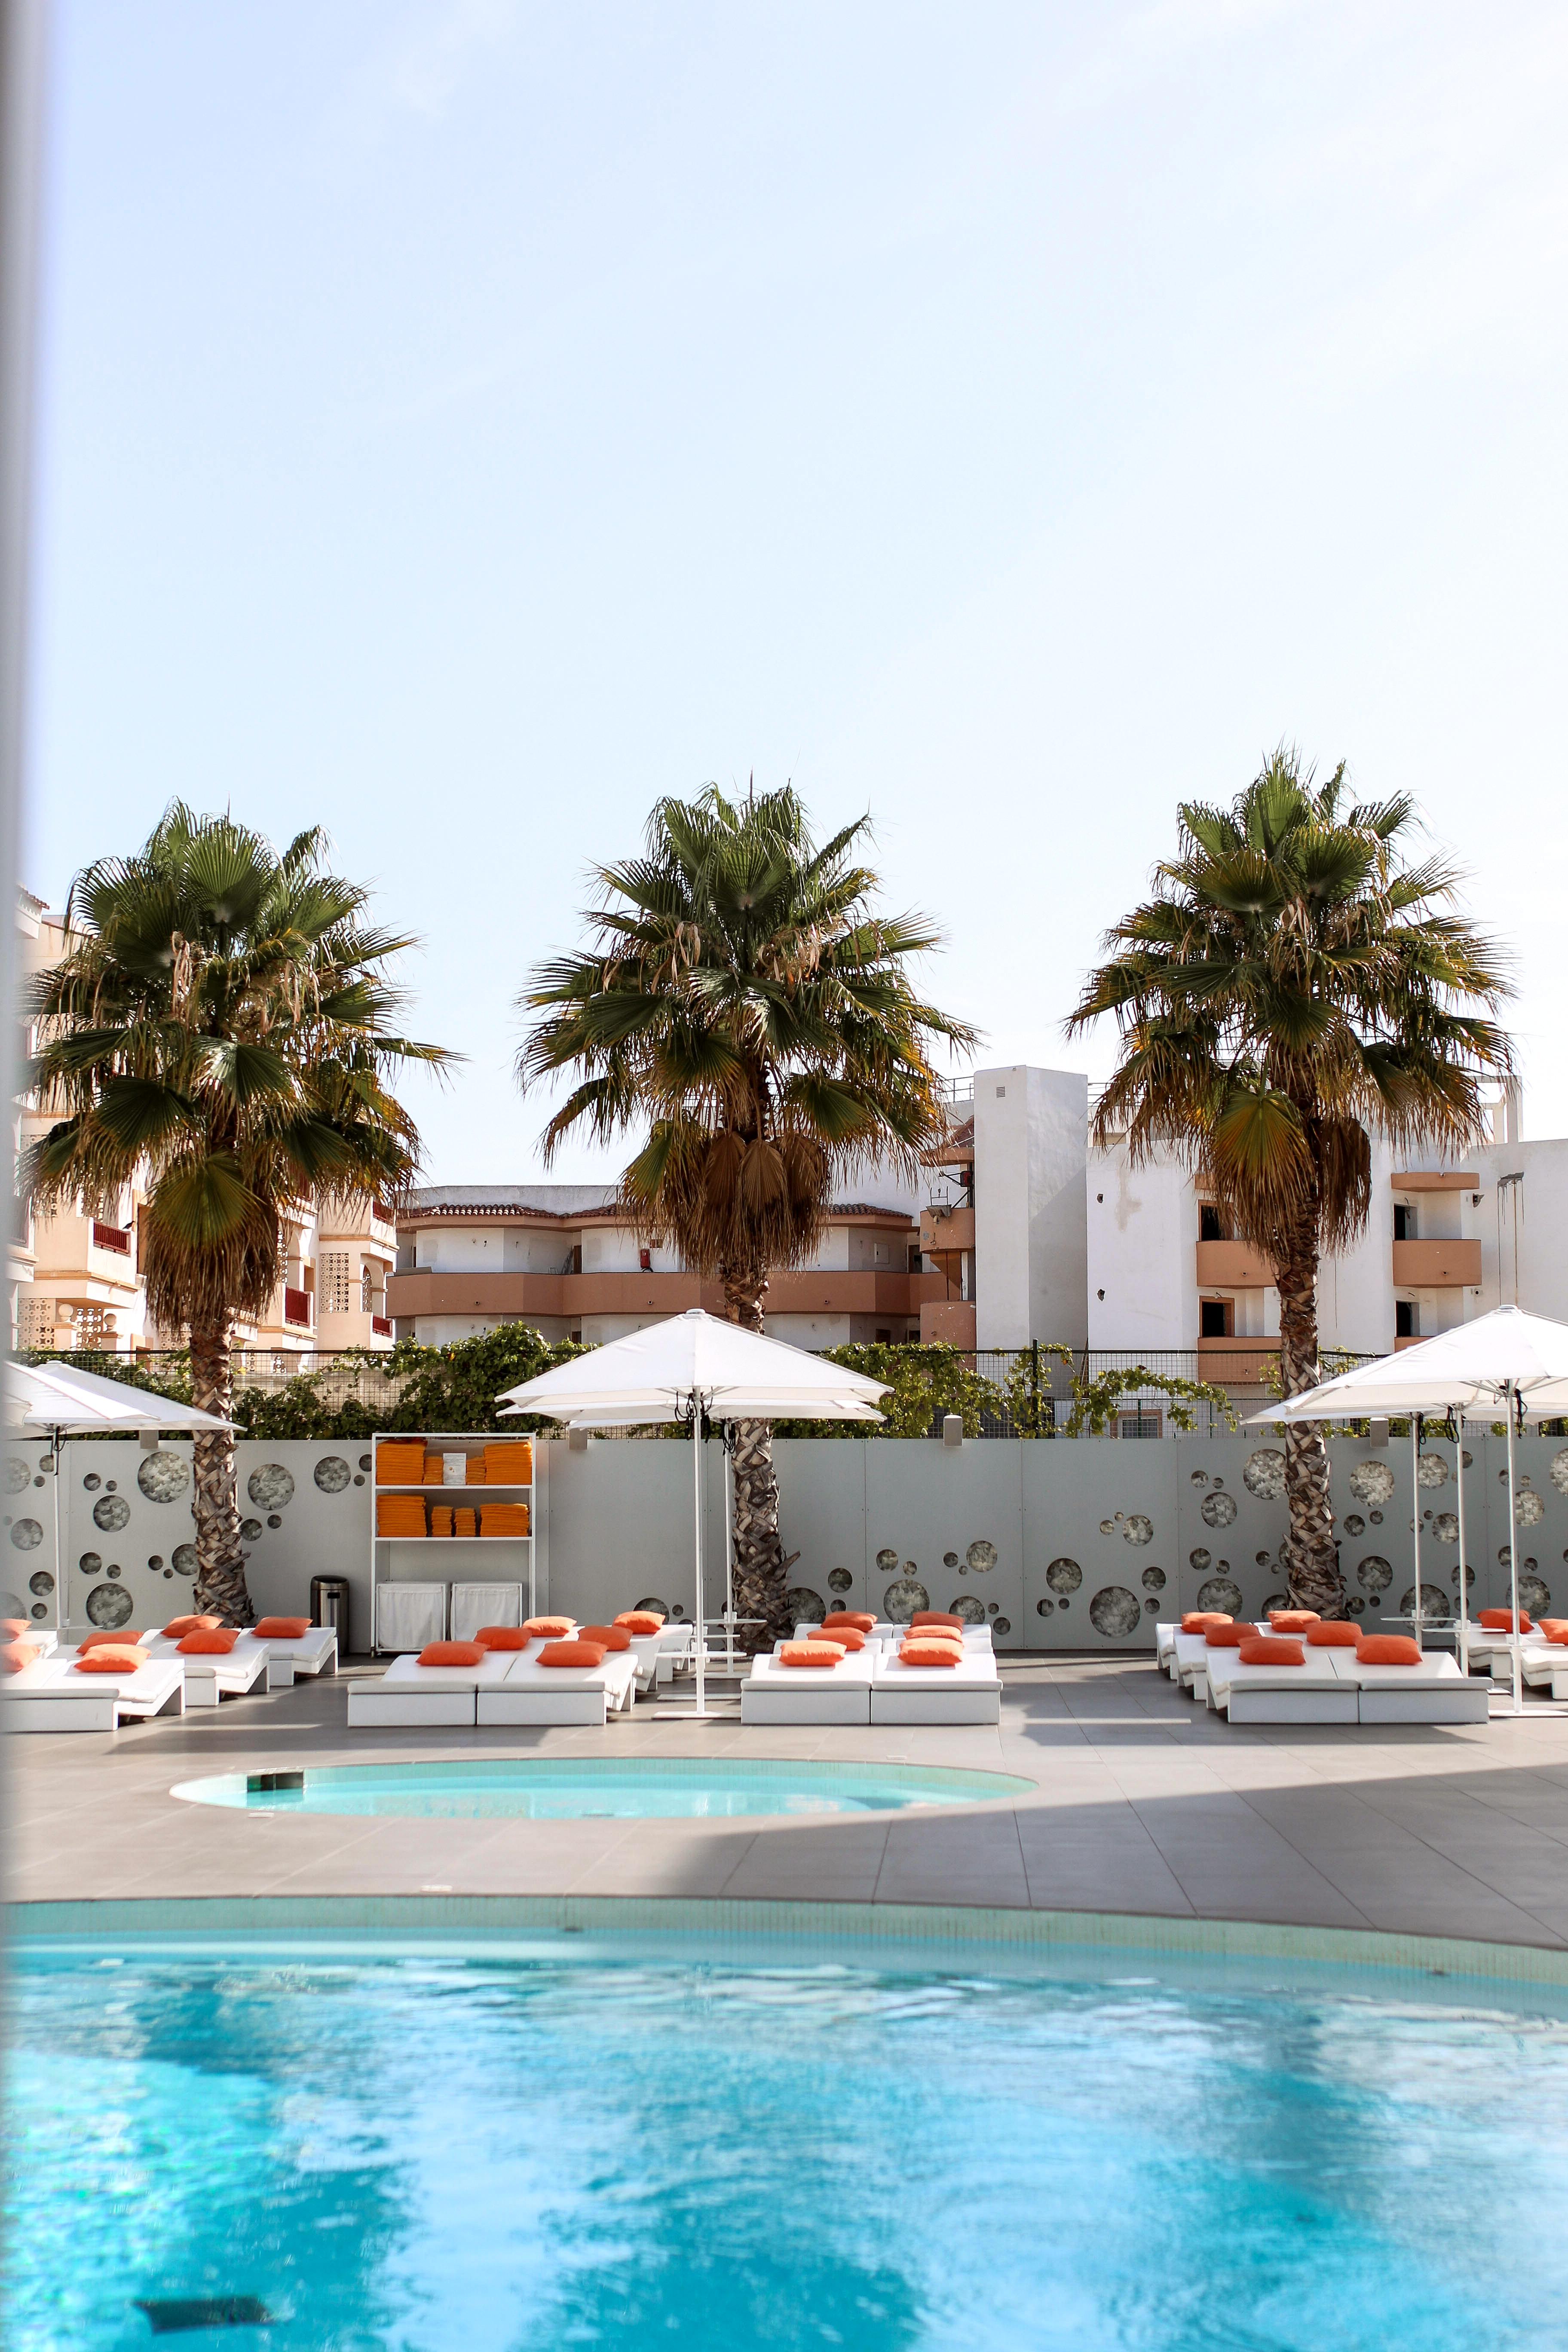 ibiza sun hotel bewertung ibiza sun apartments empfehlung erfahrung playa den bossa